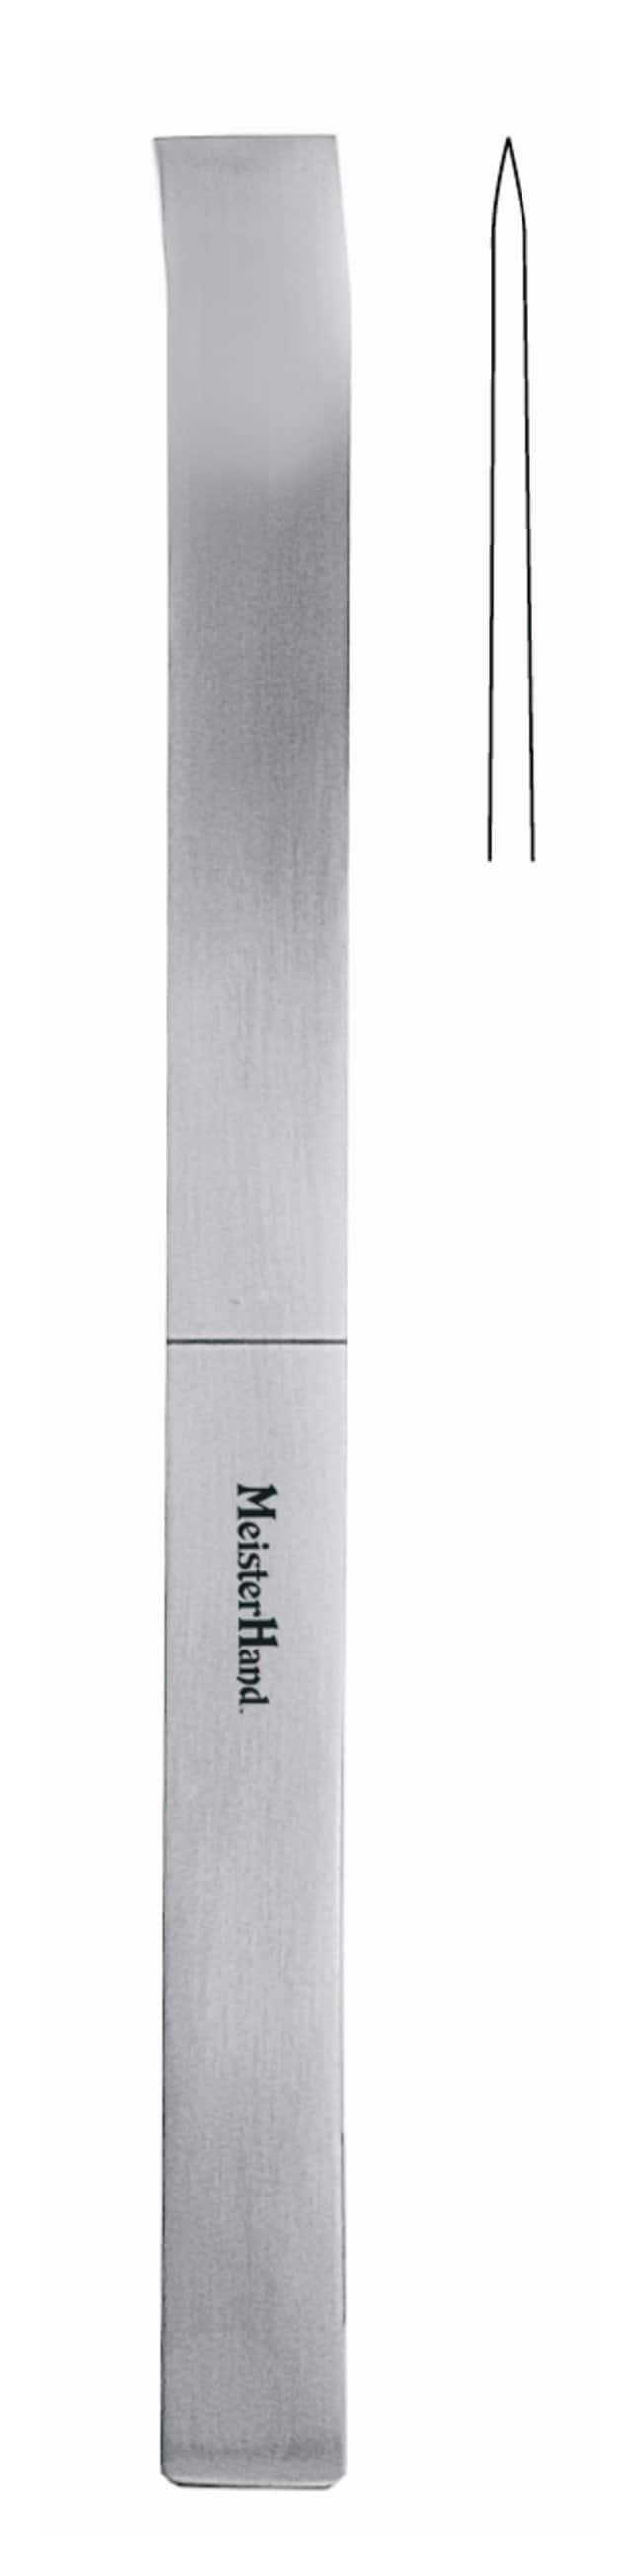 Integra Miltex MeisterHand Lambotte Osteotomes:Spatulas, Forceps and Utensils:Dissection